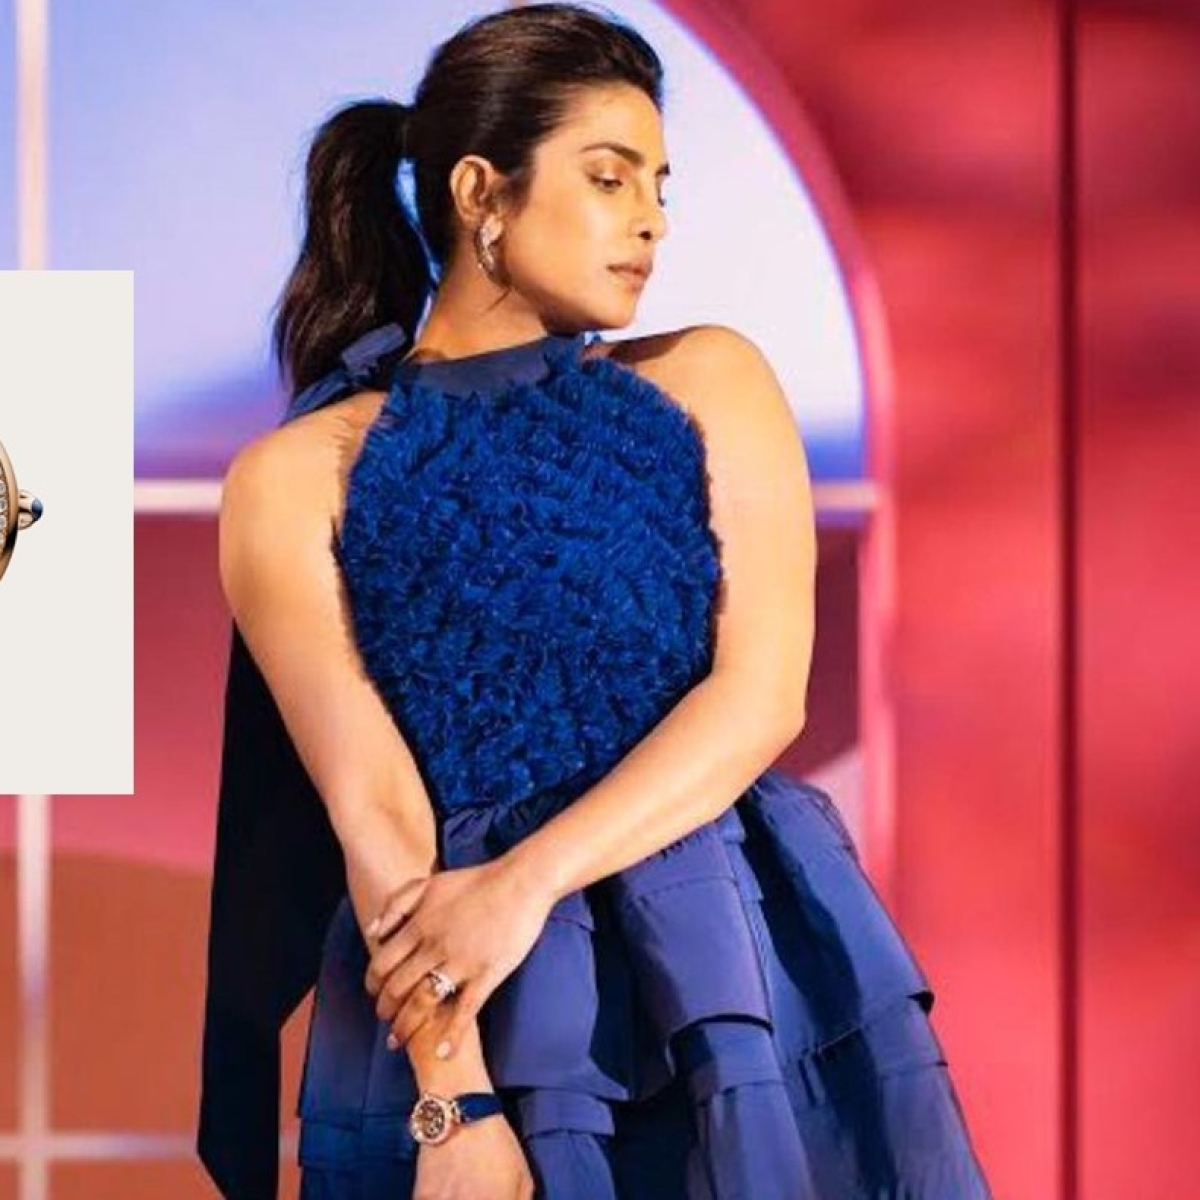 Priyanka Chopra wears Rs 32.4 lakh alligator strap watch for Oscars 2021 nominations with Nick Jonas